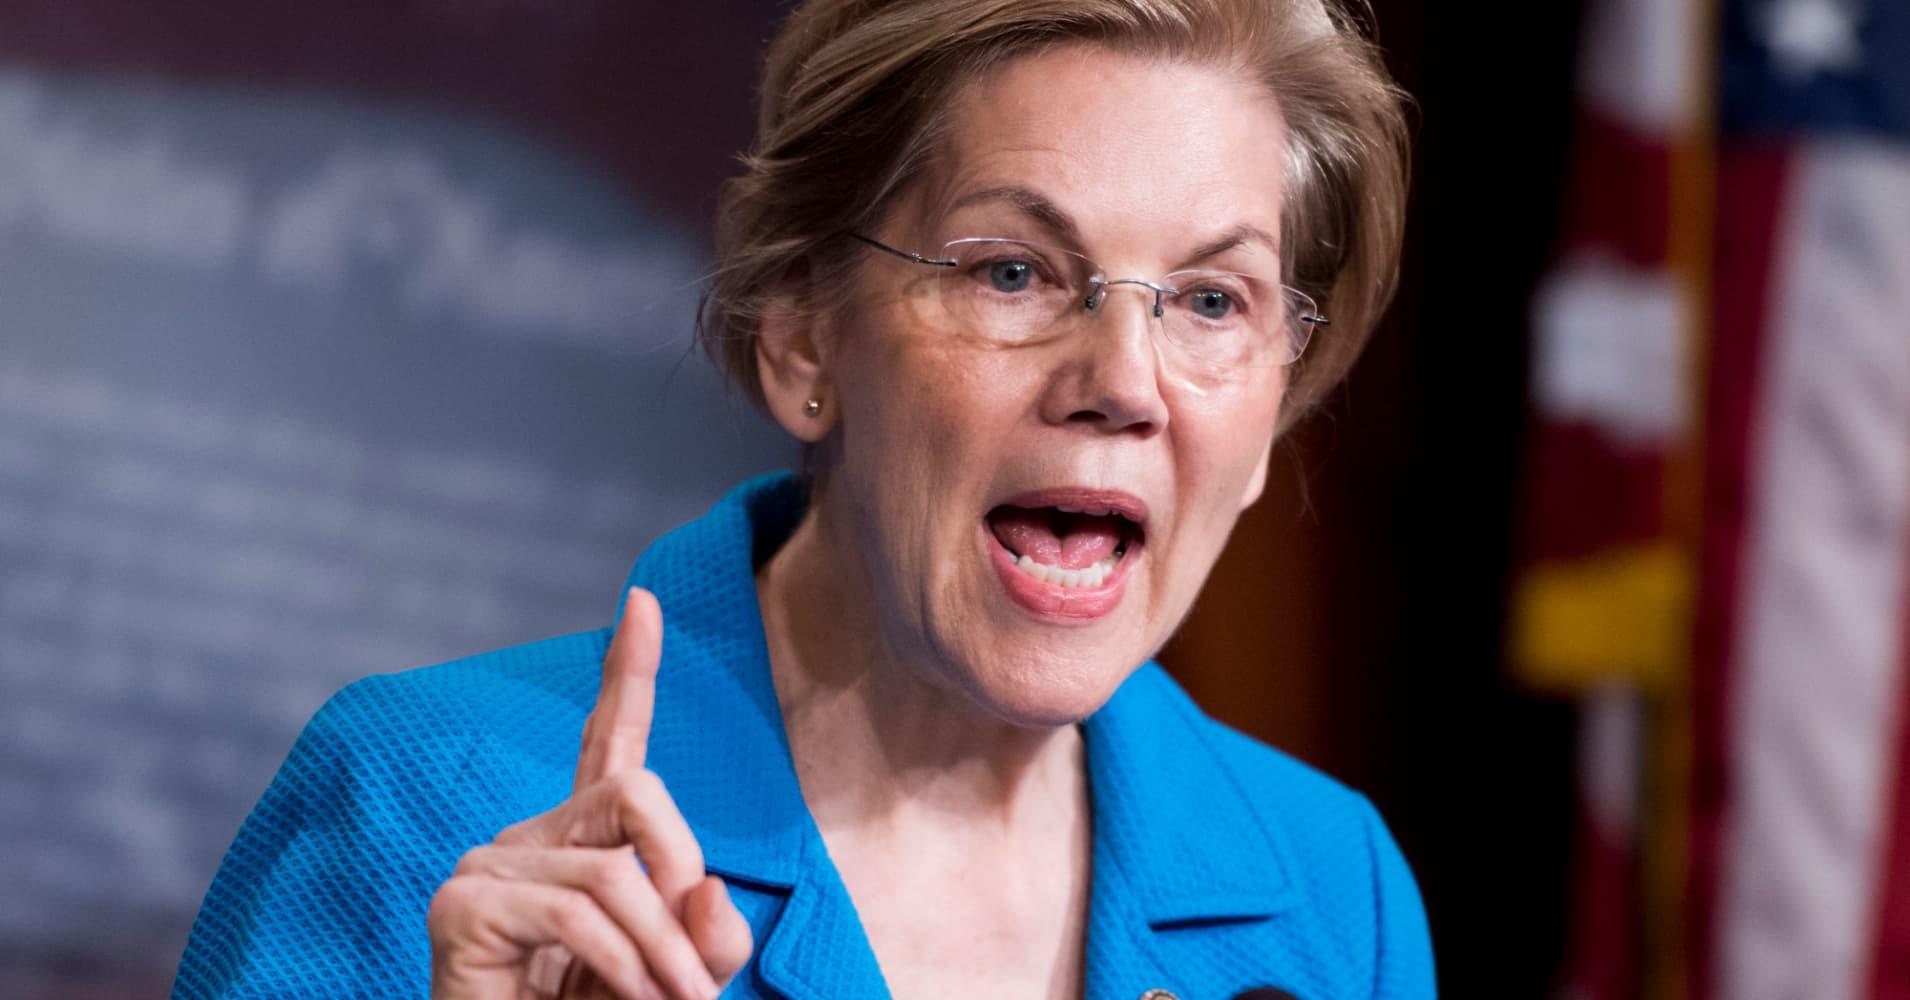 Sen. Elizabeth Warren pushes to break up big tech companies like Amazon and Facebook